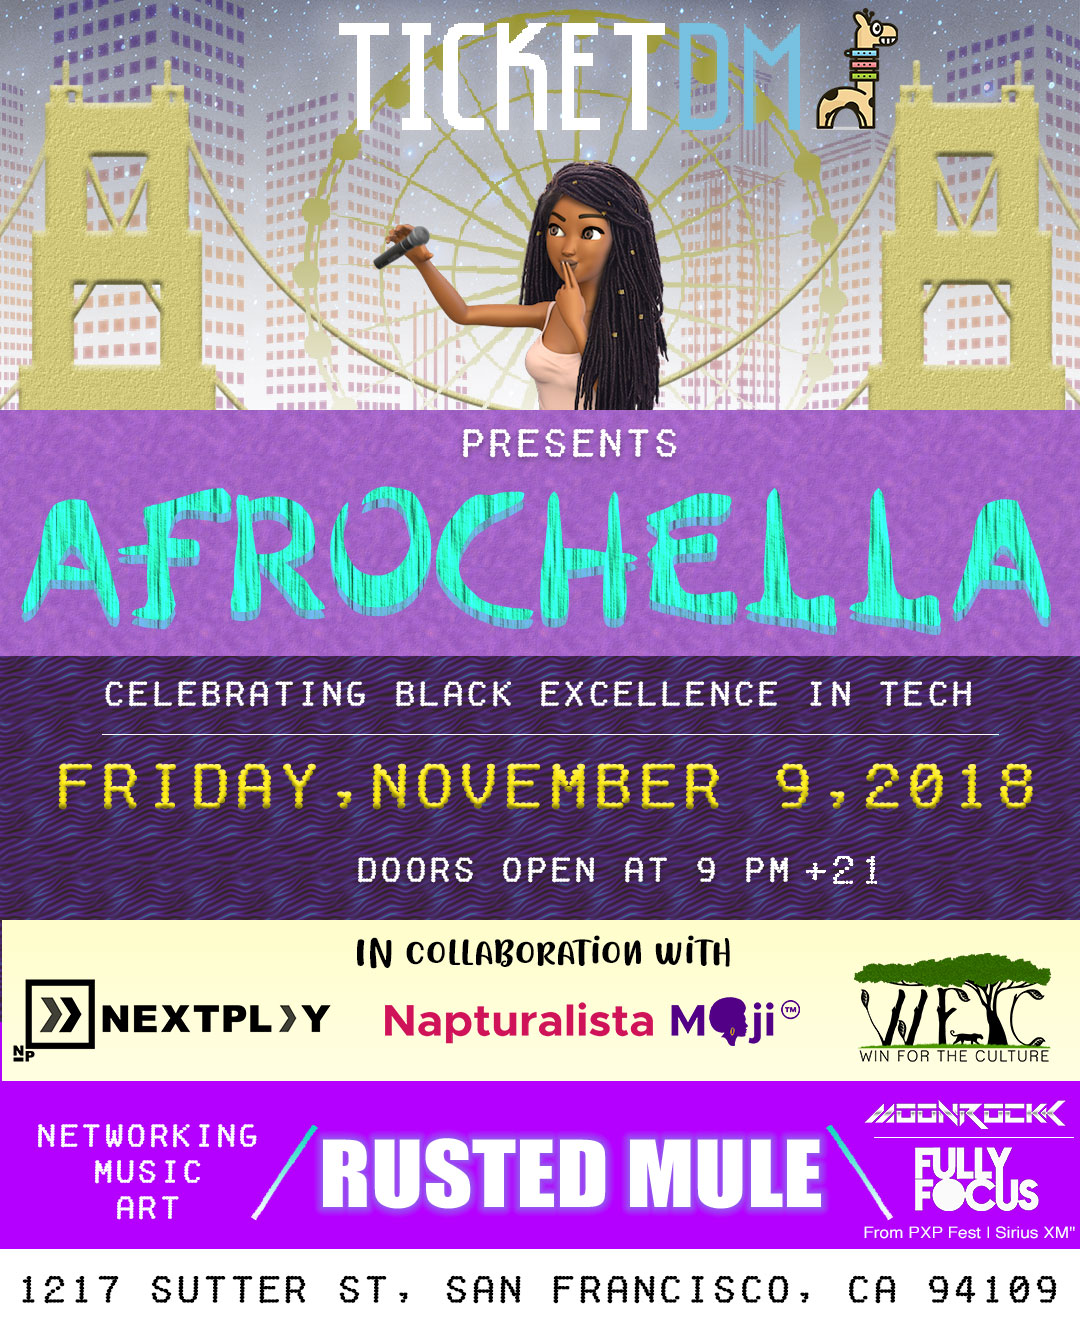 TicketDM Afrochella